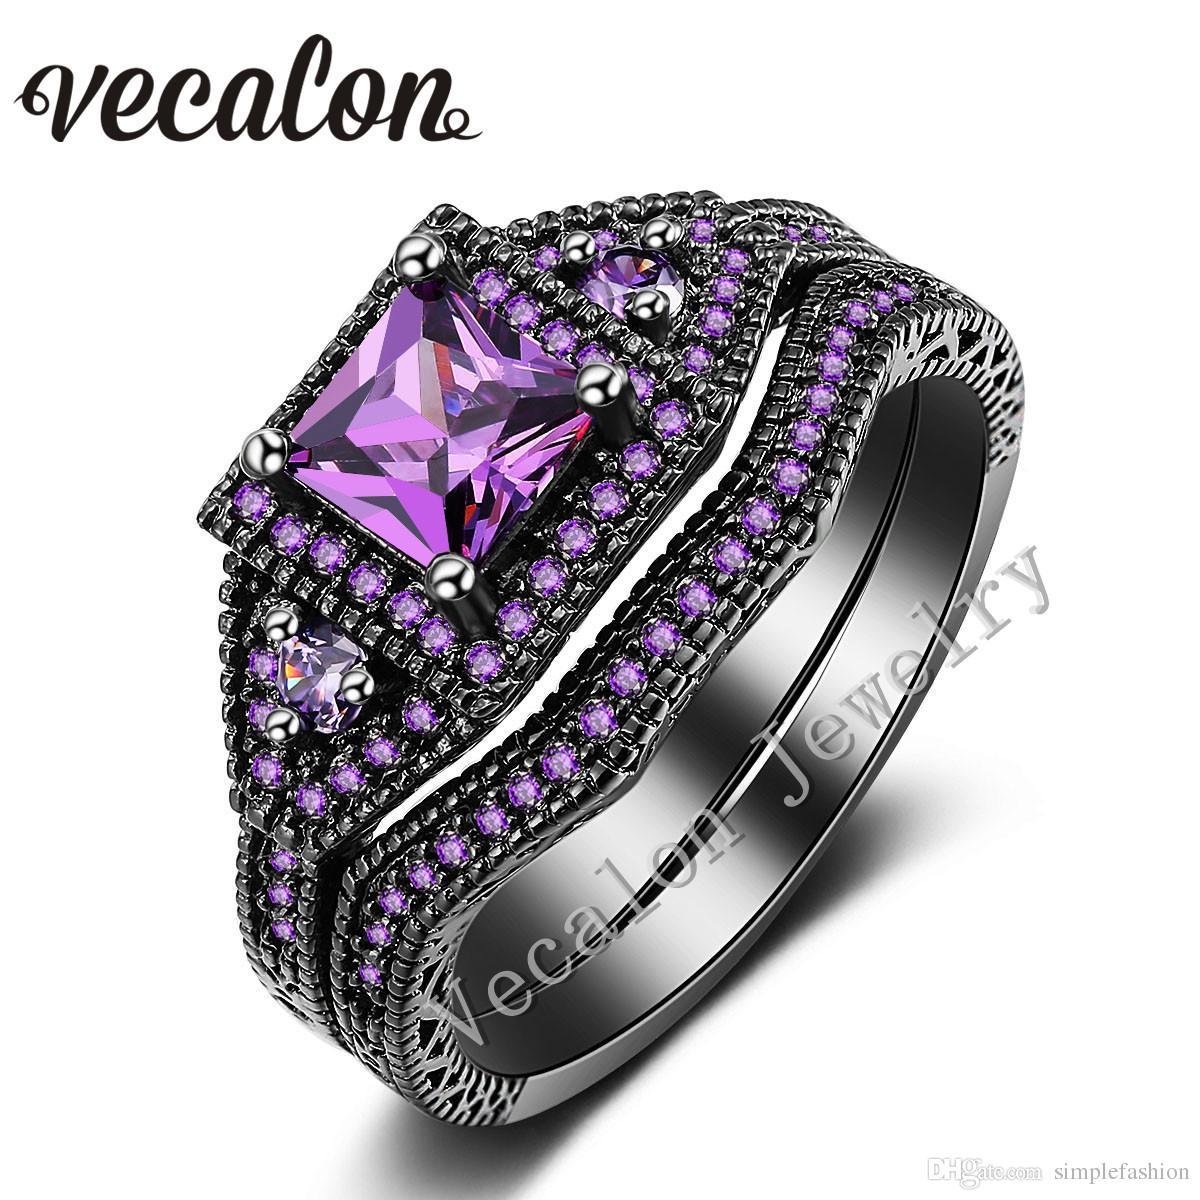 2019 Vecalon Tremdy New Wedding Band Ring Set For Women Amethyst